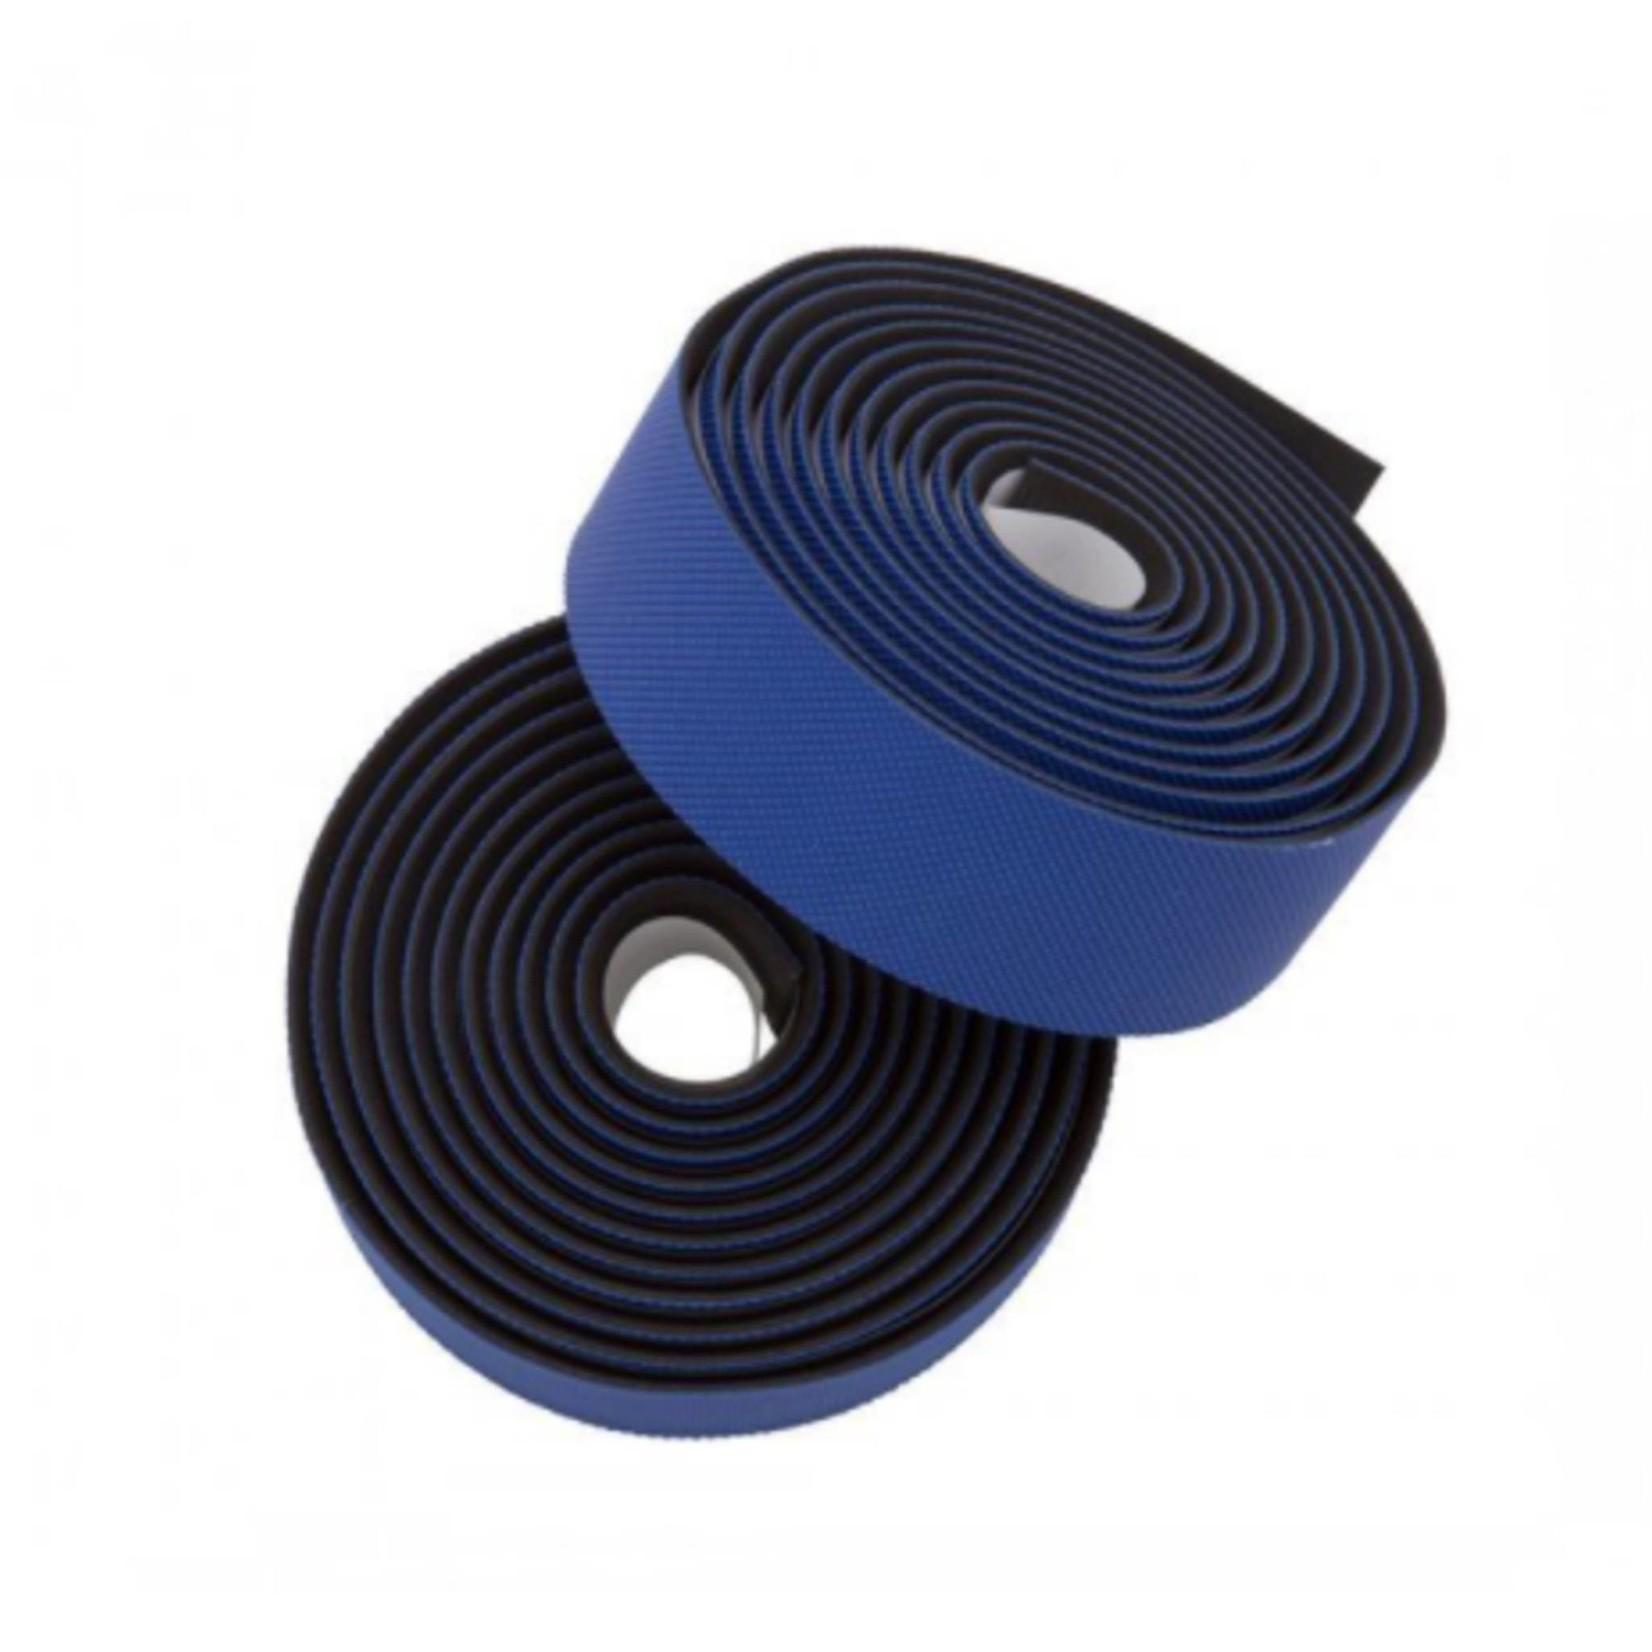 Velo Tachyon Anti Slip Bar Tape Blue